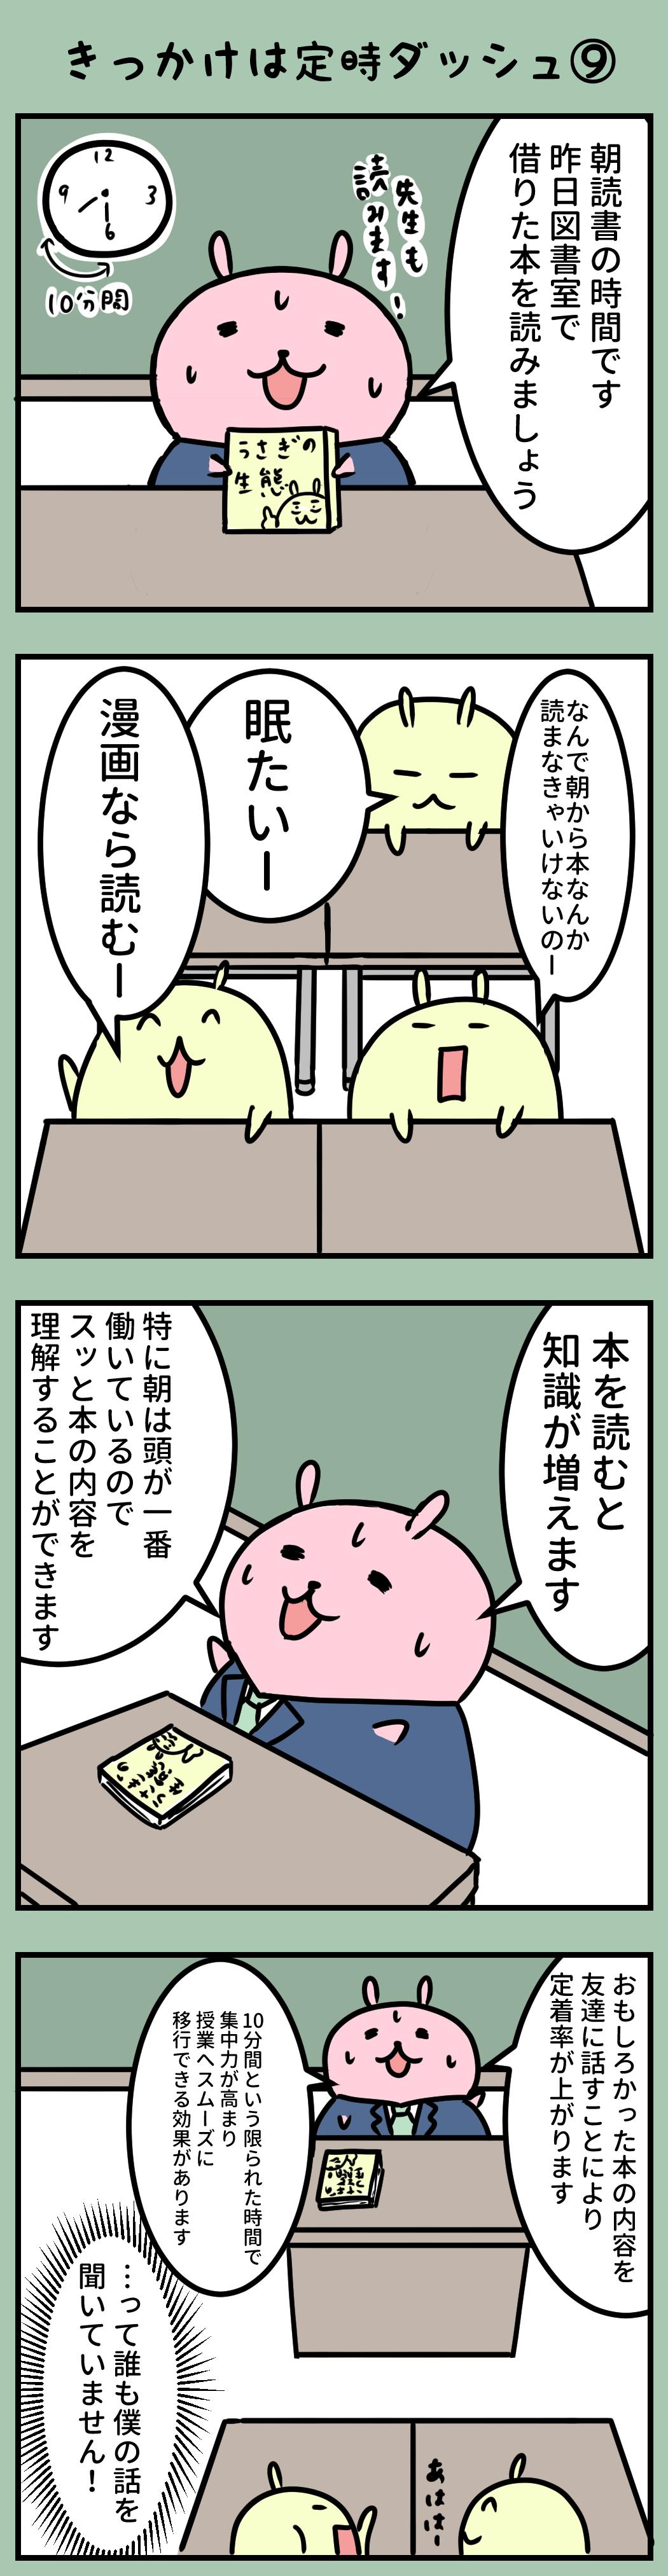 朝読書の効果 小学校